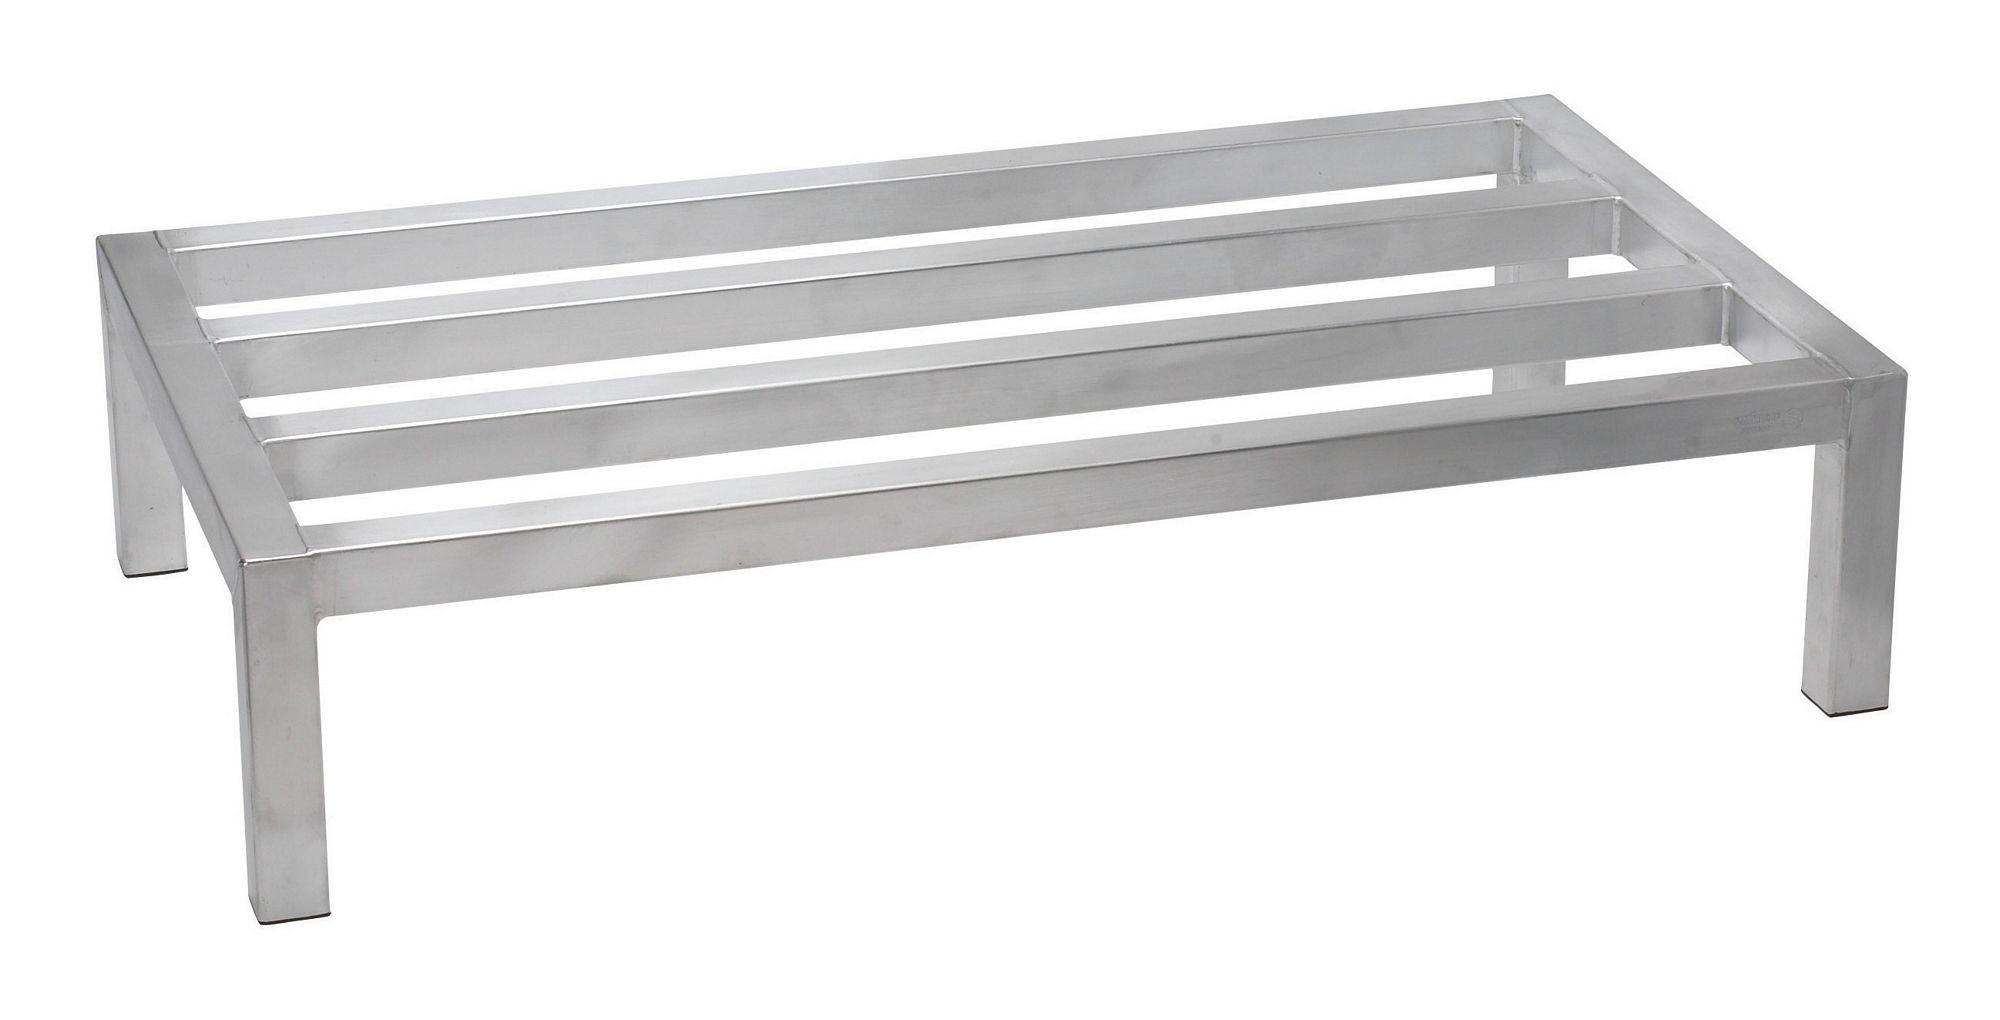 Aluminum Dunnage Rack, 20